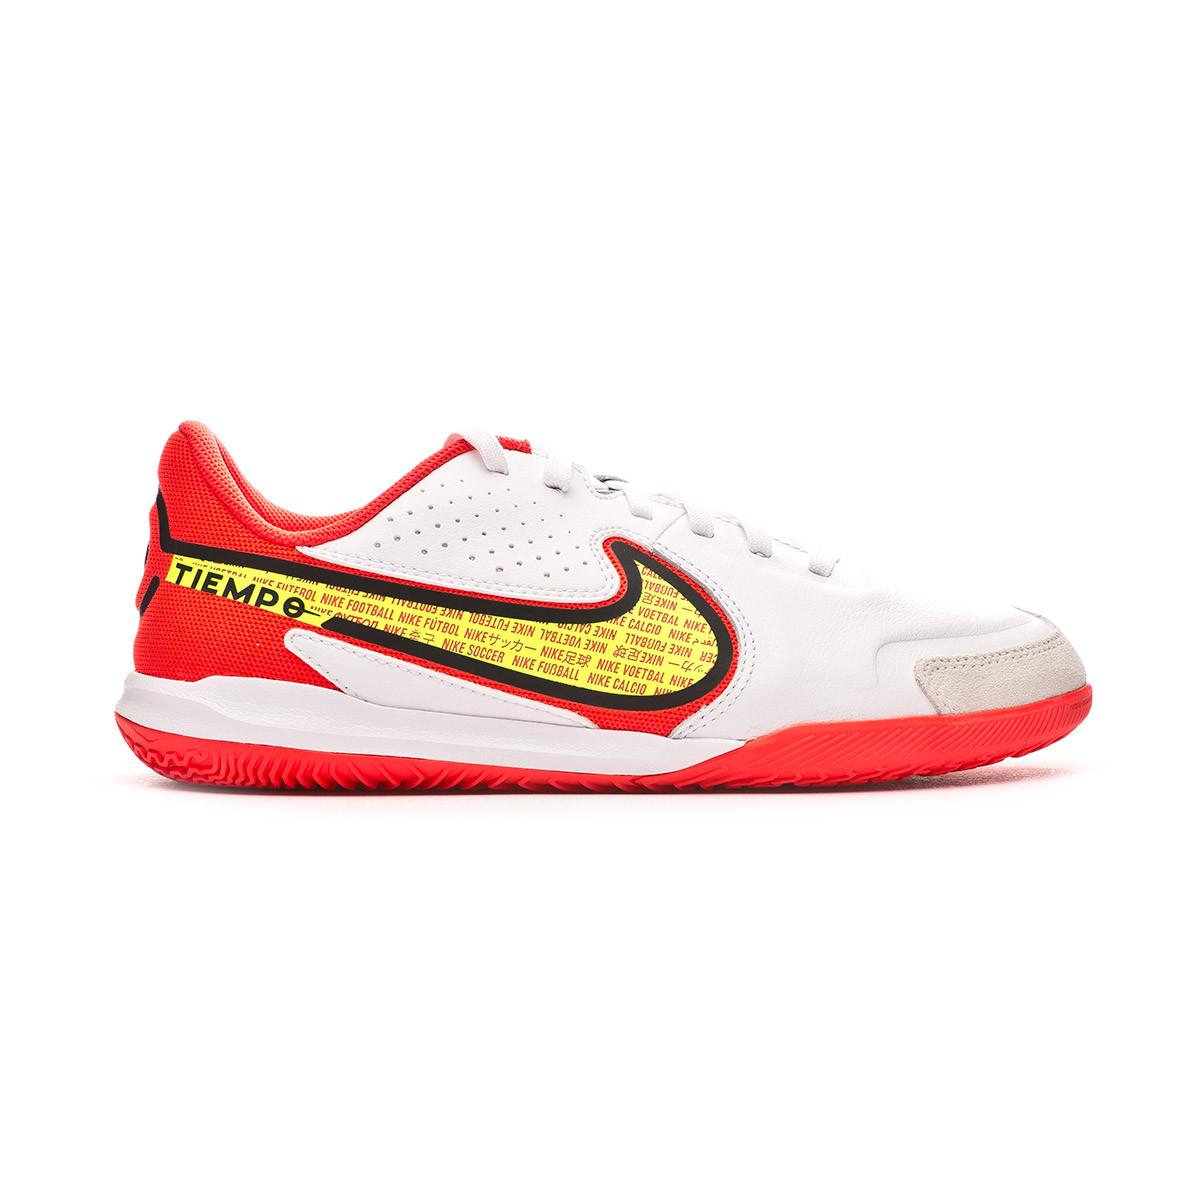 Chaussure de futsal Nike Tiempo Legend 9 Academy IC Enfant